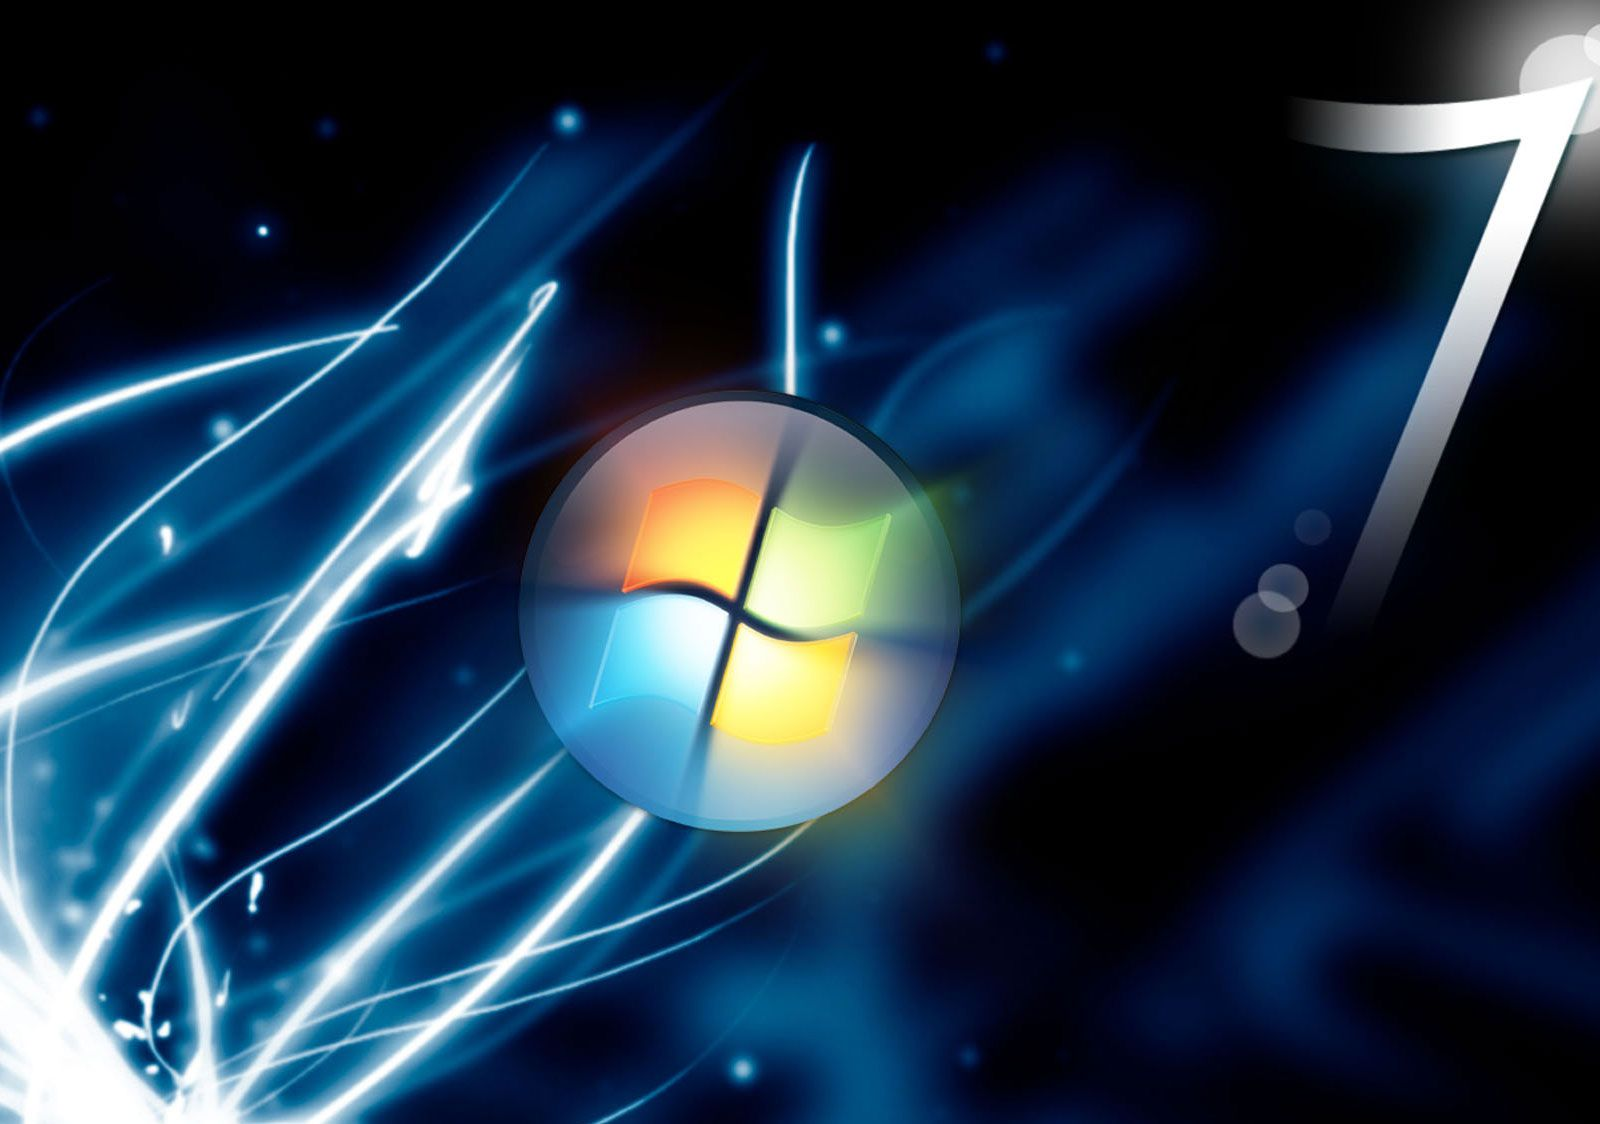 Animated Desktop Wallpapers Top Free Animated Desktop